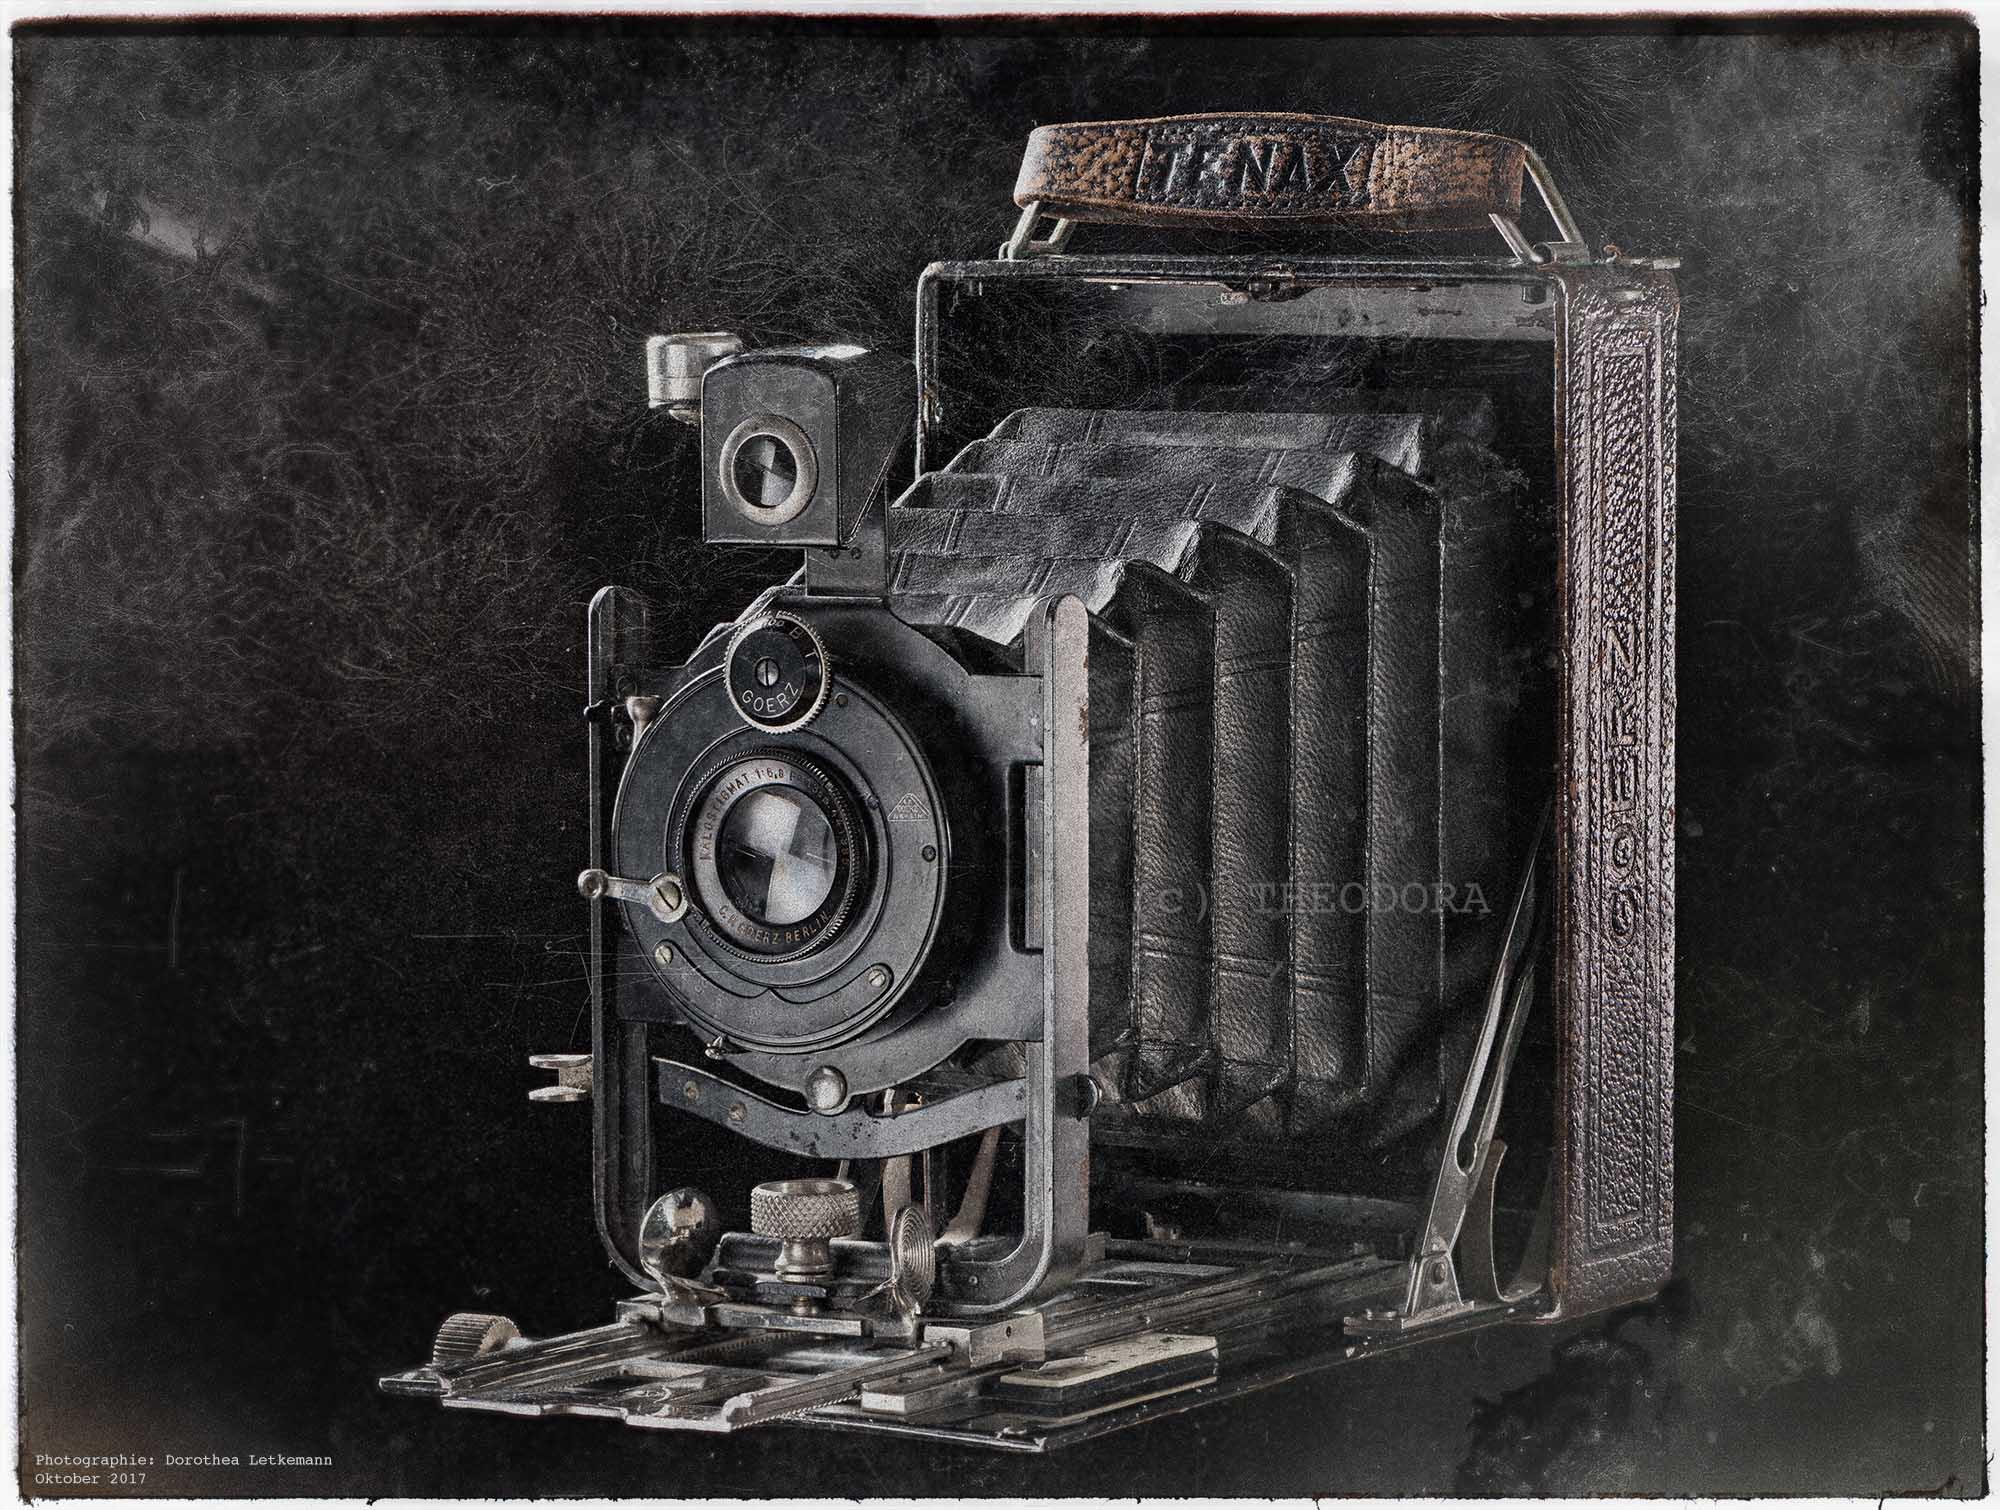 C.P. Goerz Tenax (ca. 1920)